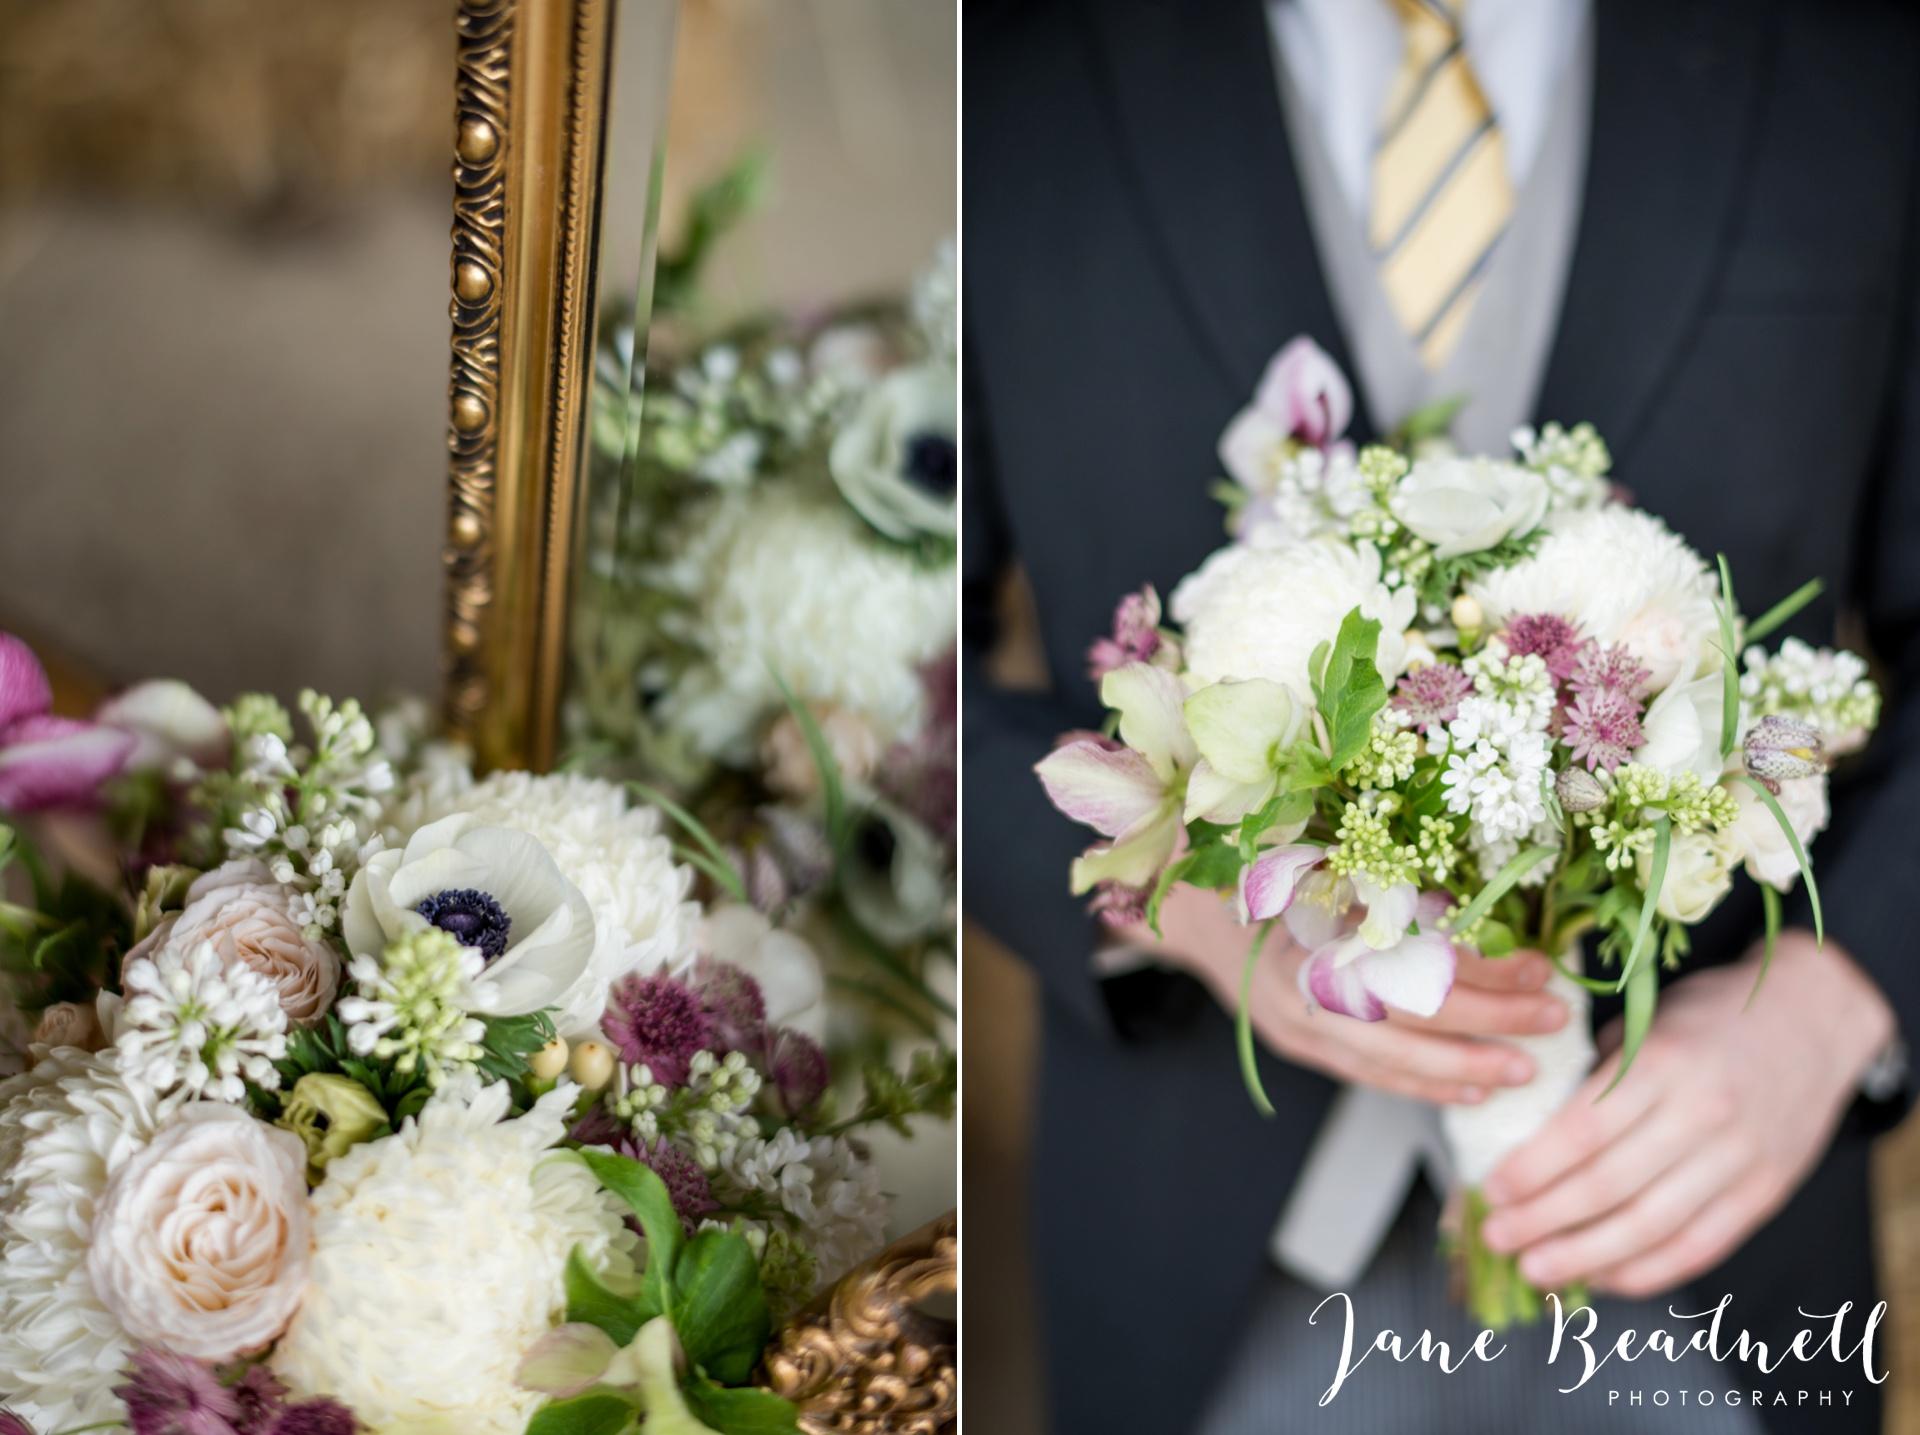 Jane Beadnell fine art wedding photographer Swinton Park24